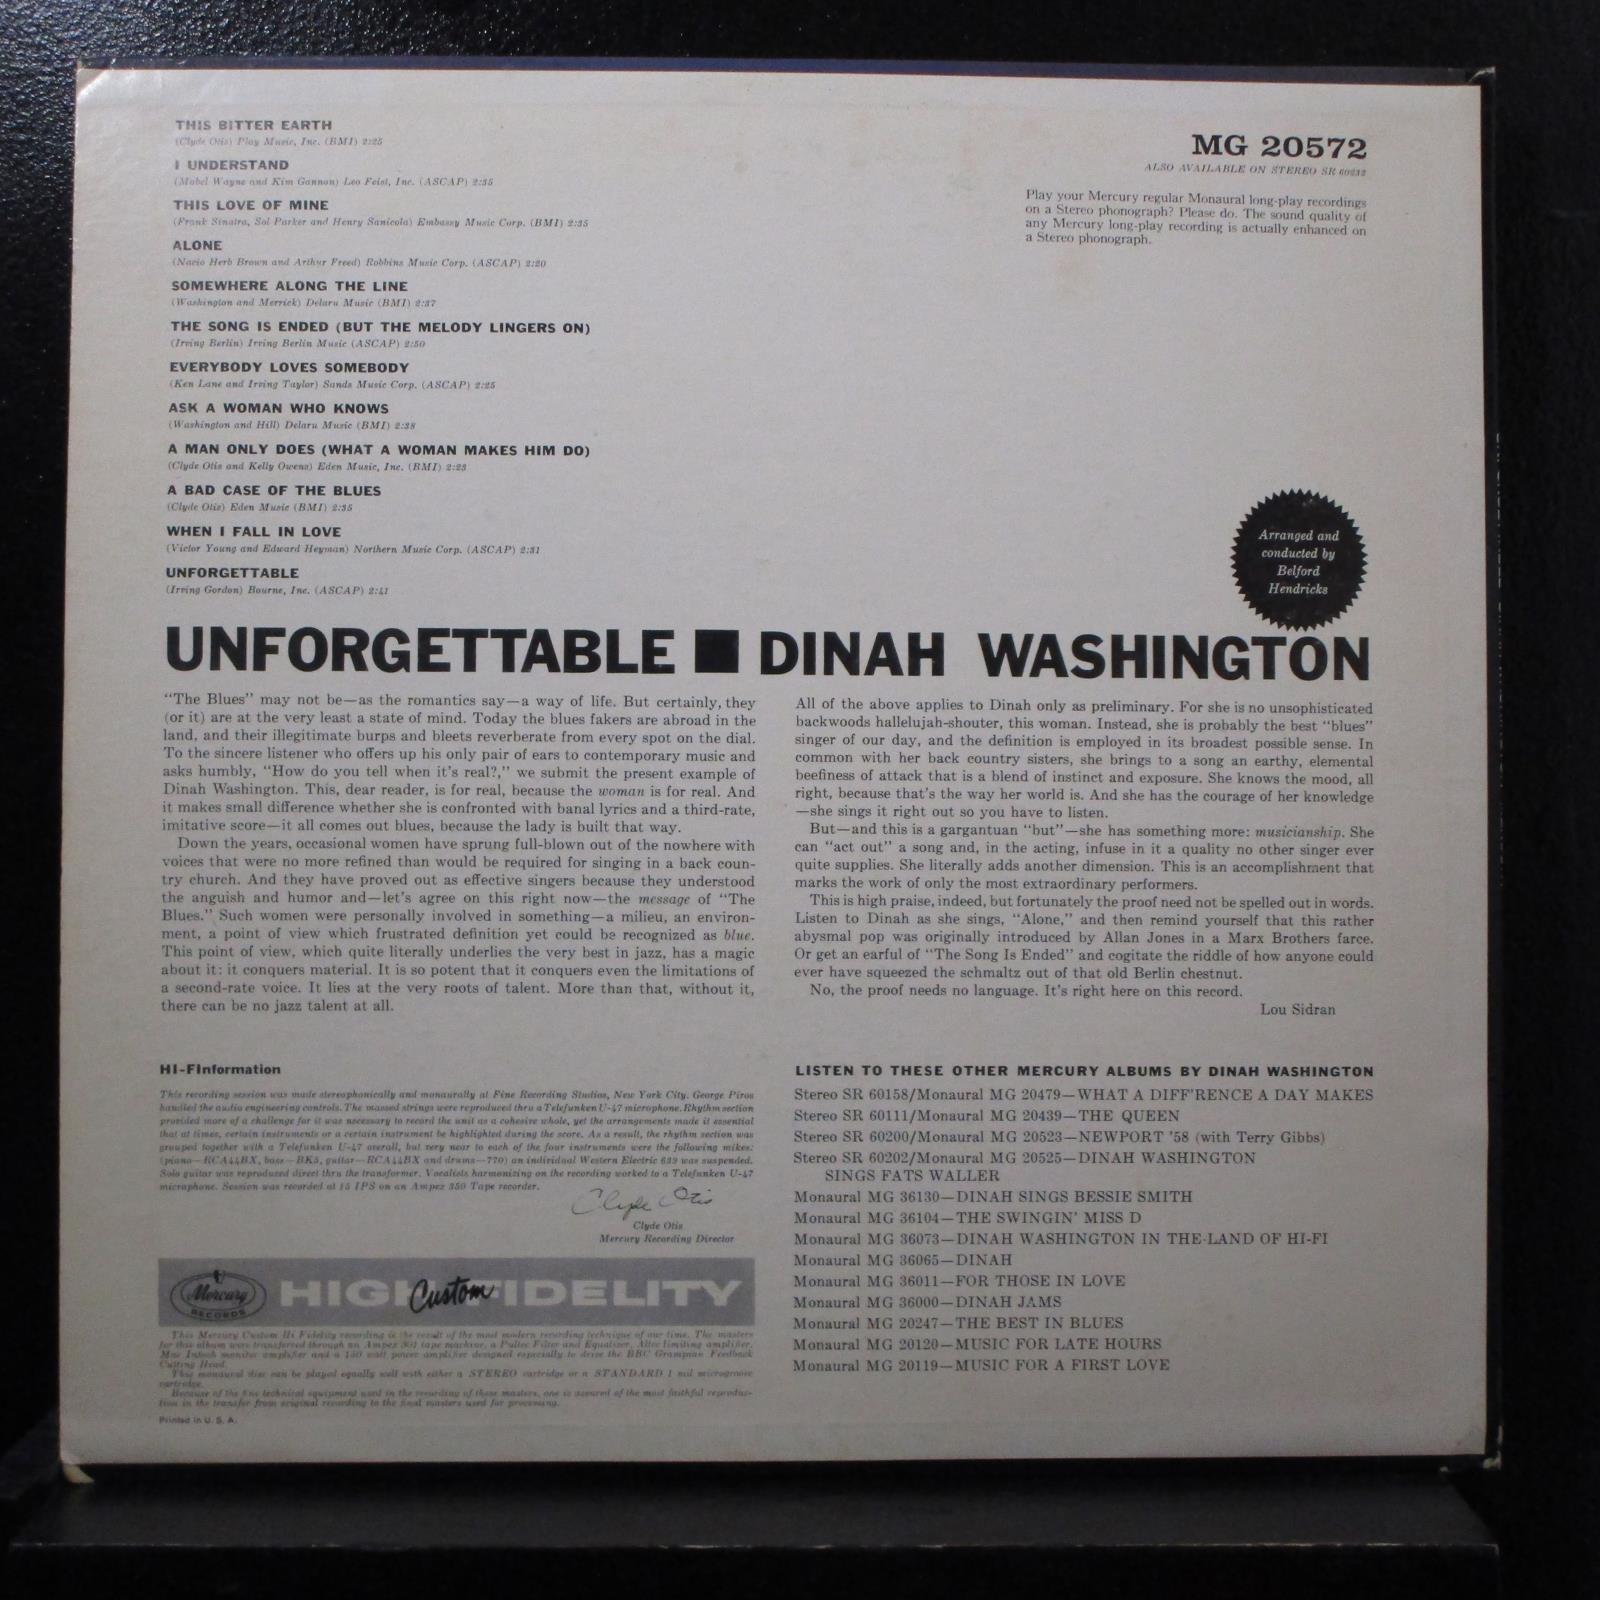 Dinah Washington Unforgettable Lp Mint Mg 20572 Mono